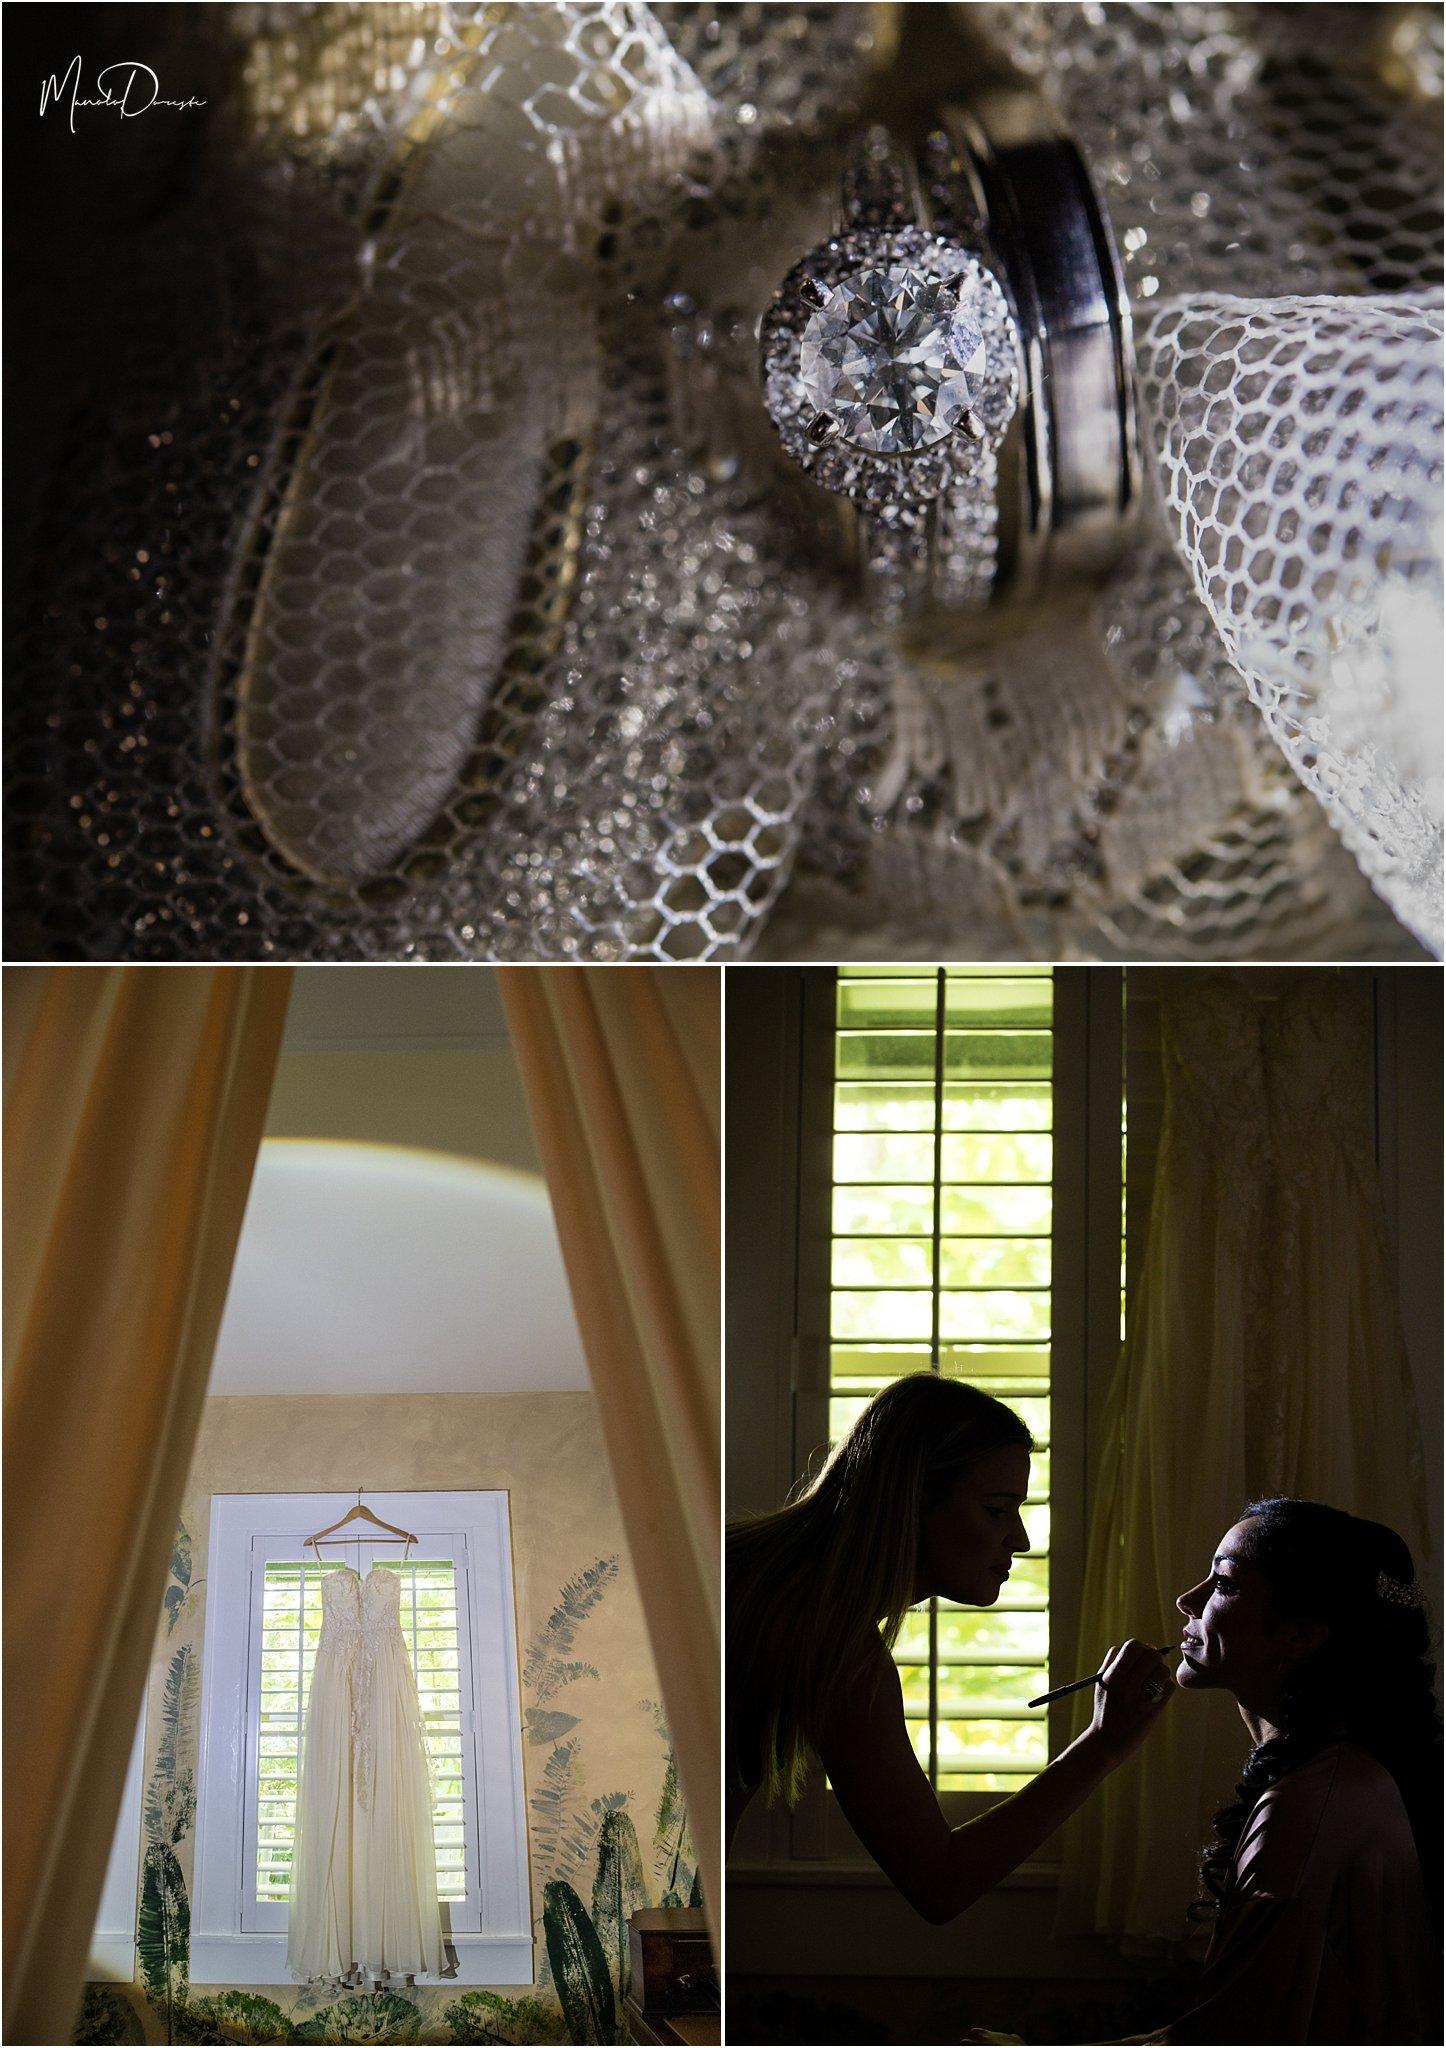 0496_ManoloDoreste_InFocusStudios_Wedding_Family_Photography_Miami_MiamiPhotographer.jpg